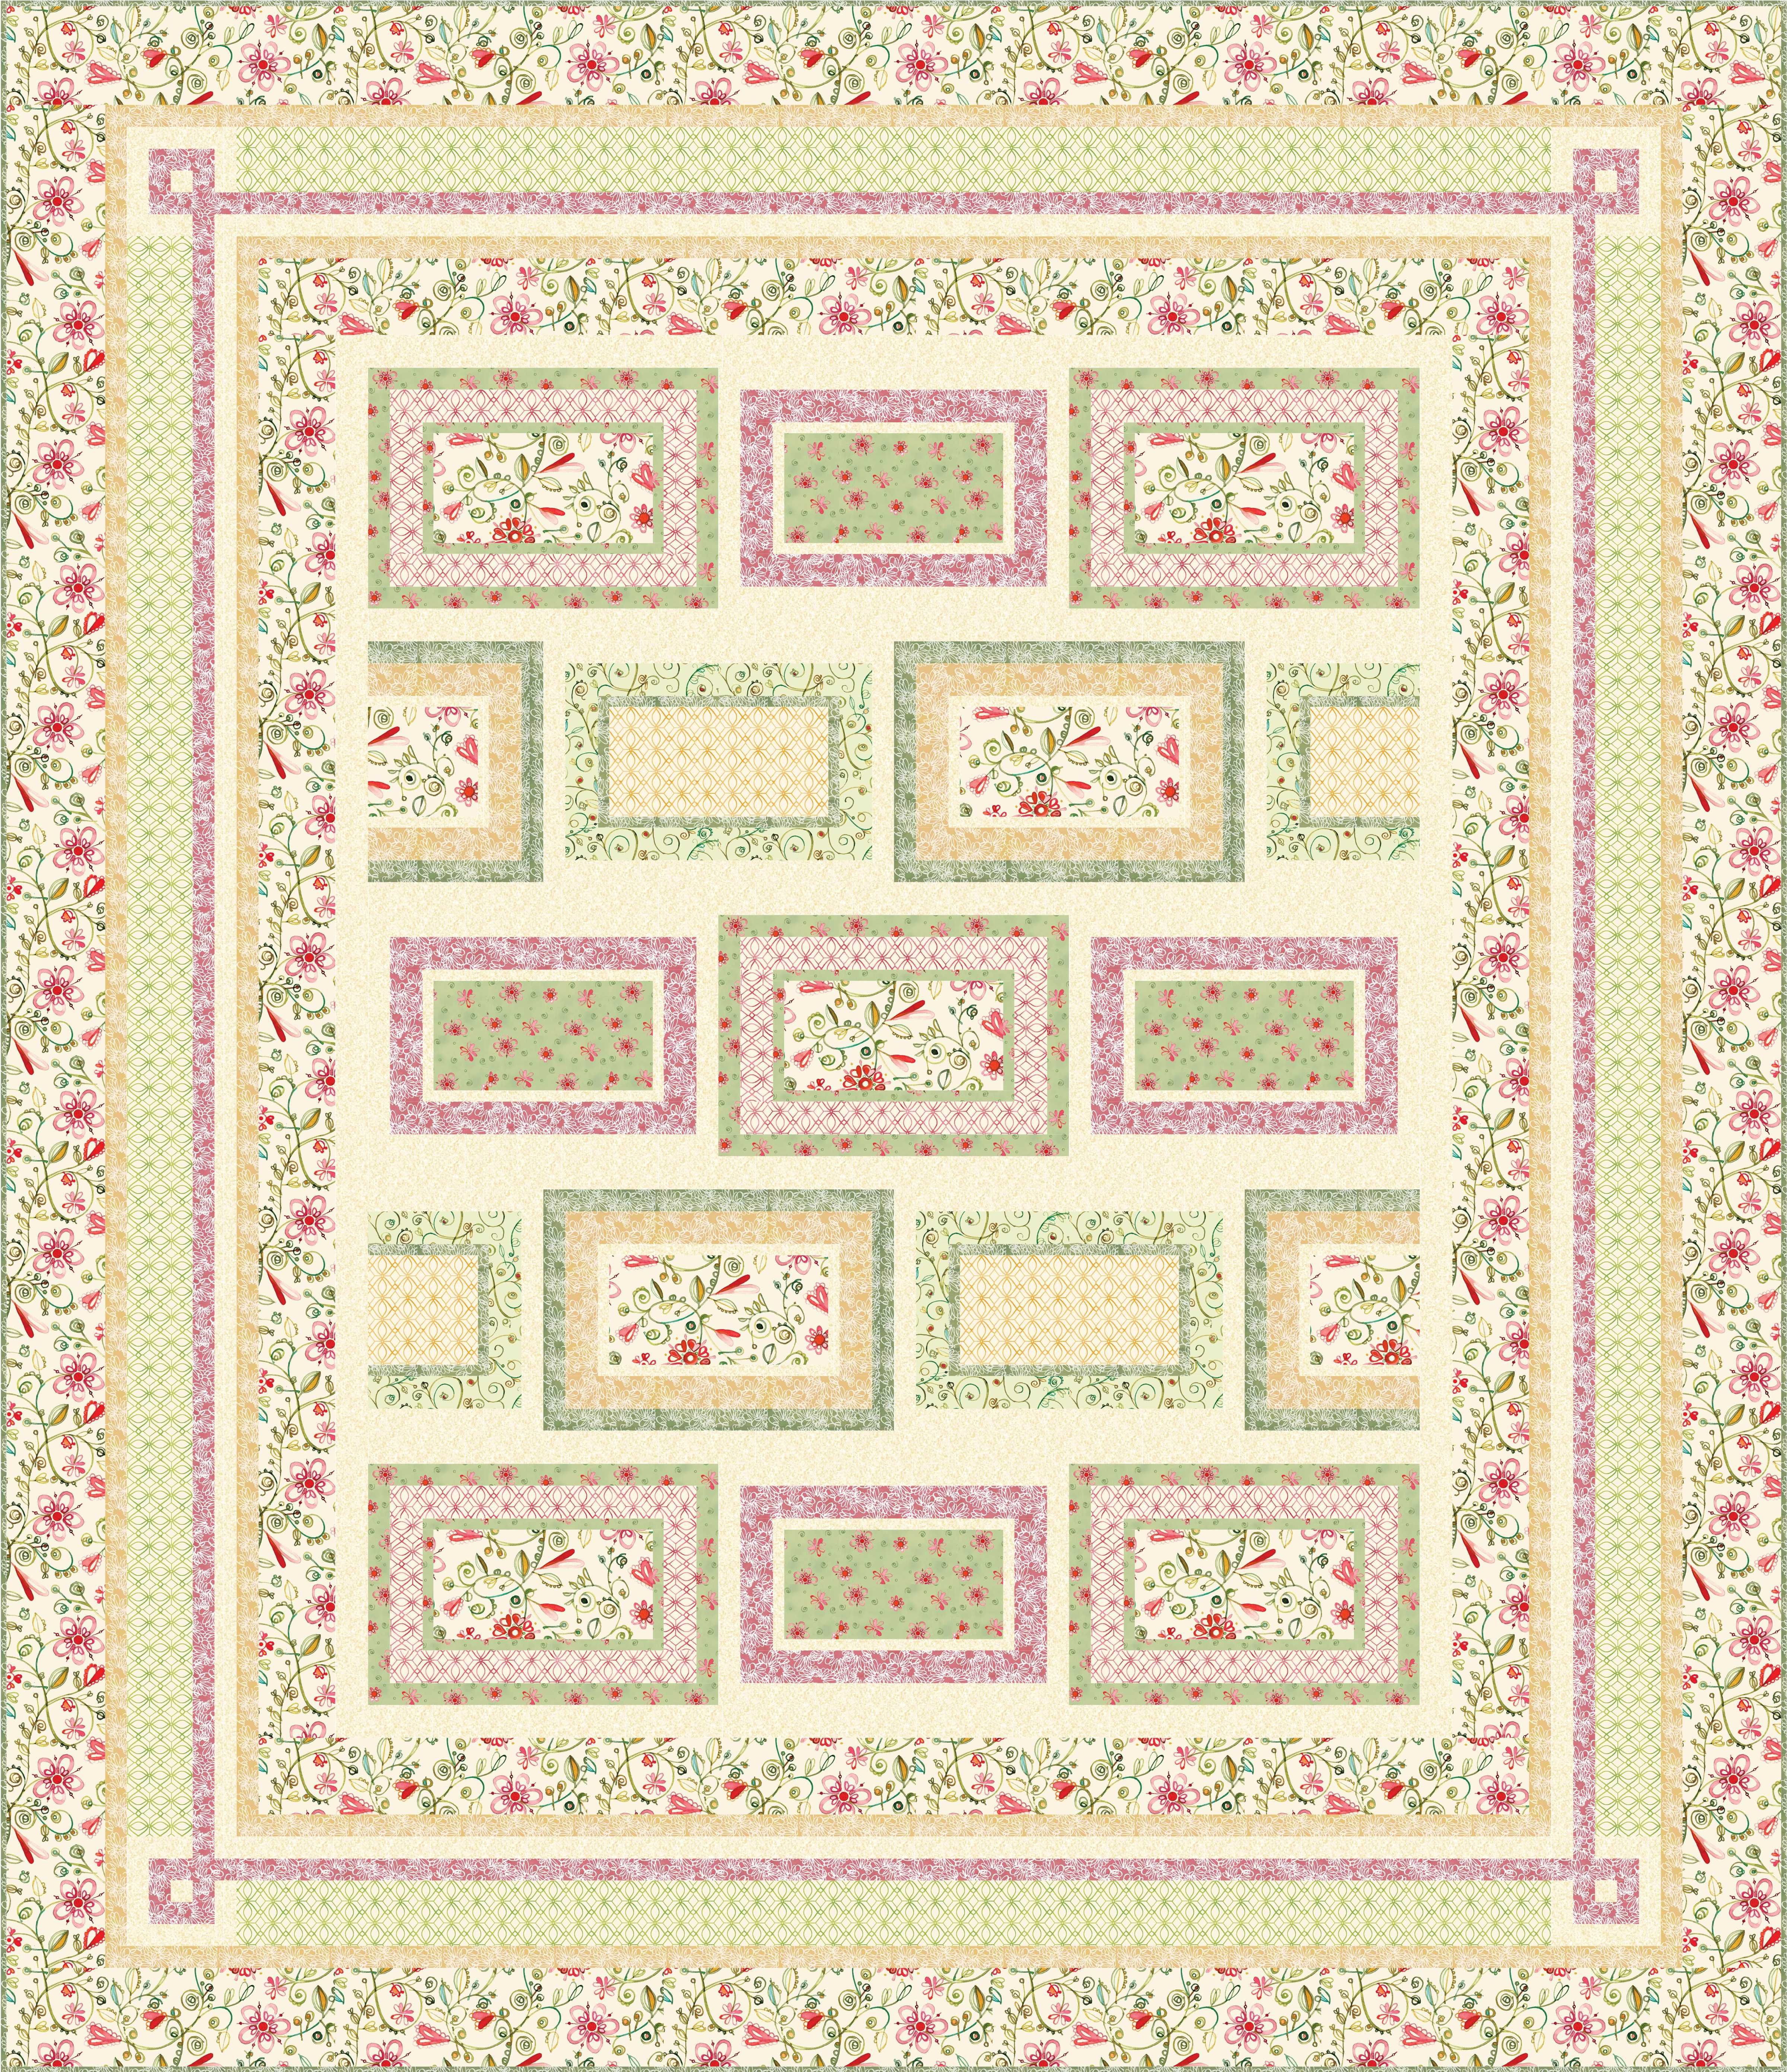 FREE PATTERN: Ariel | Ariel, Patterns and Free pattern : quilting treasures free patterns - Adamdwight.com